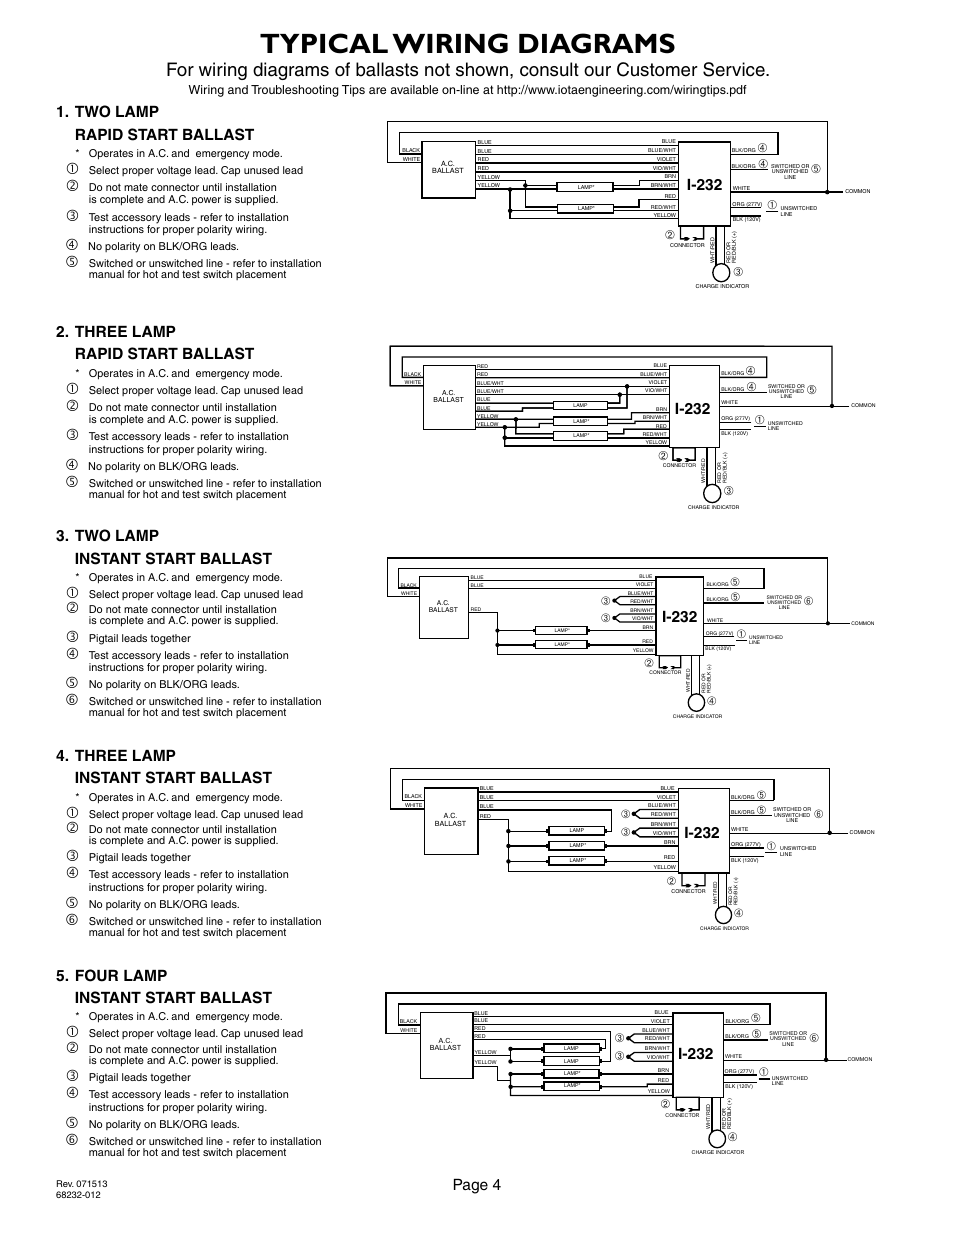 iota i 232 page4?resize=665%2C861 iota i 320 wiring diagram lighting diagrams, pinout diagrams iota i 320 wiring diagram at panicattacktreatment.co